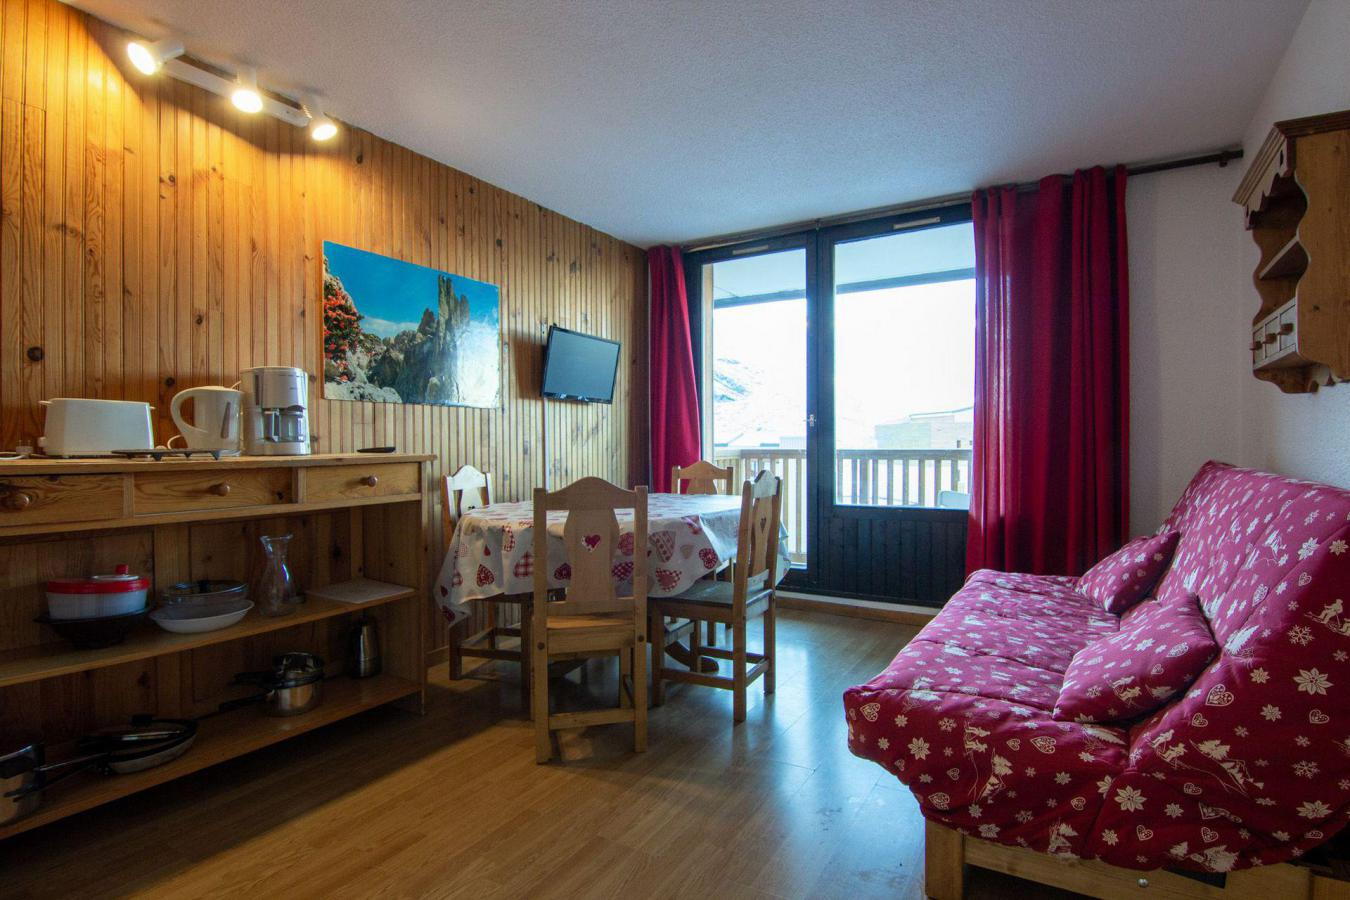 Location au ski Appartement 3 pièces 6 personnes (72) - Residence Roche Blanche - Val Thorens - Canapé